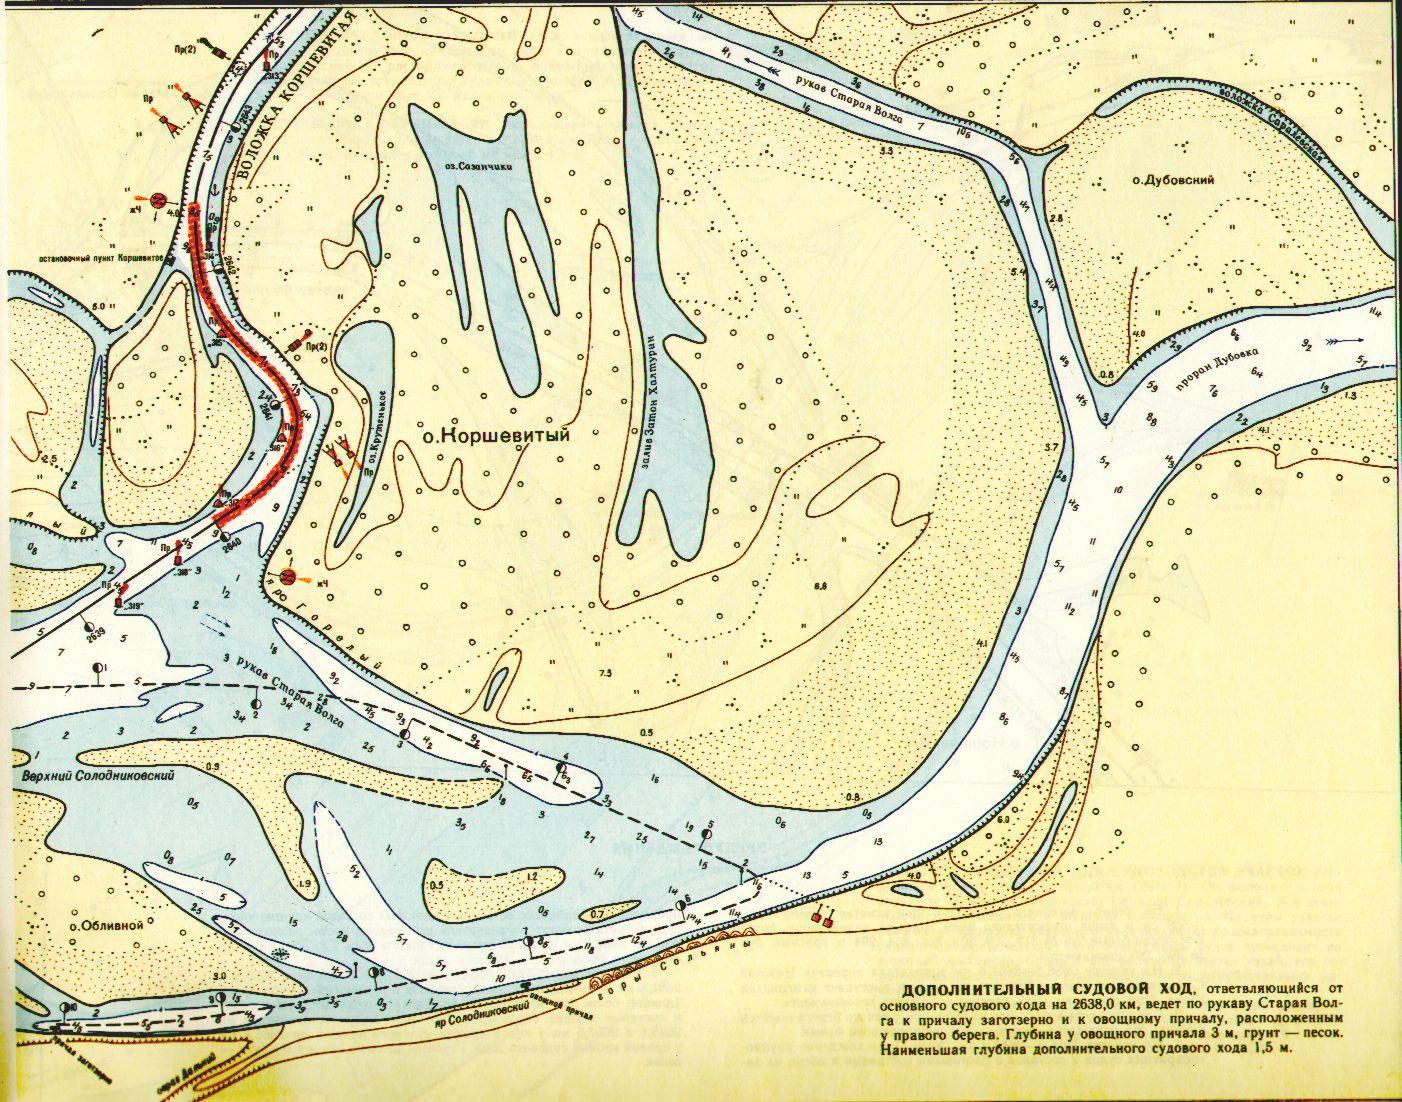 дон река карта рыбалка